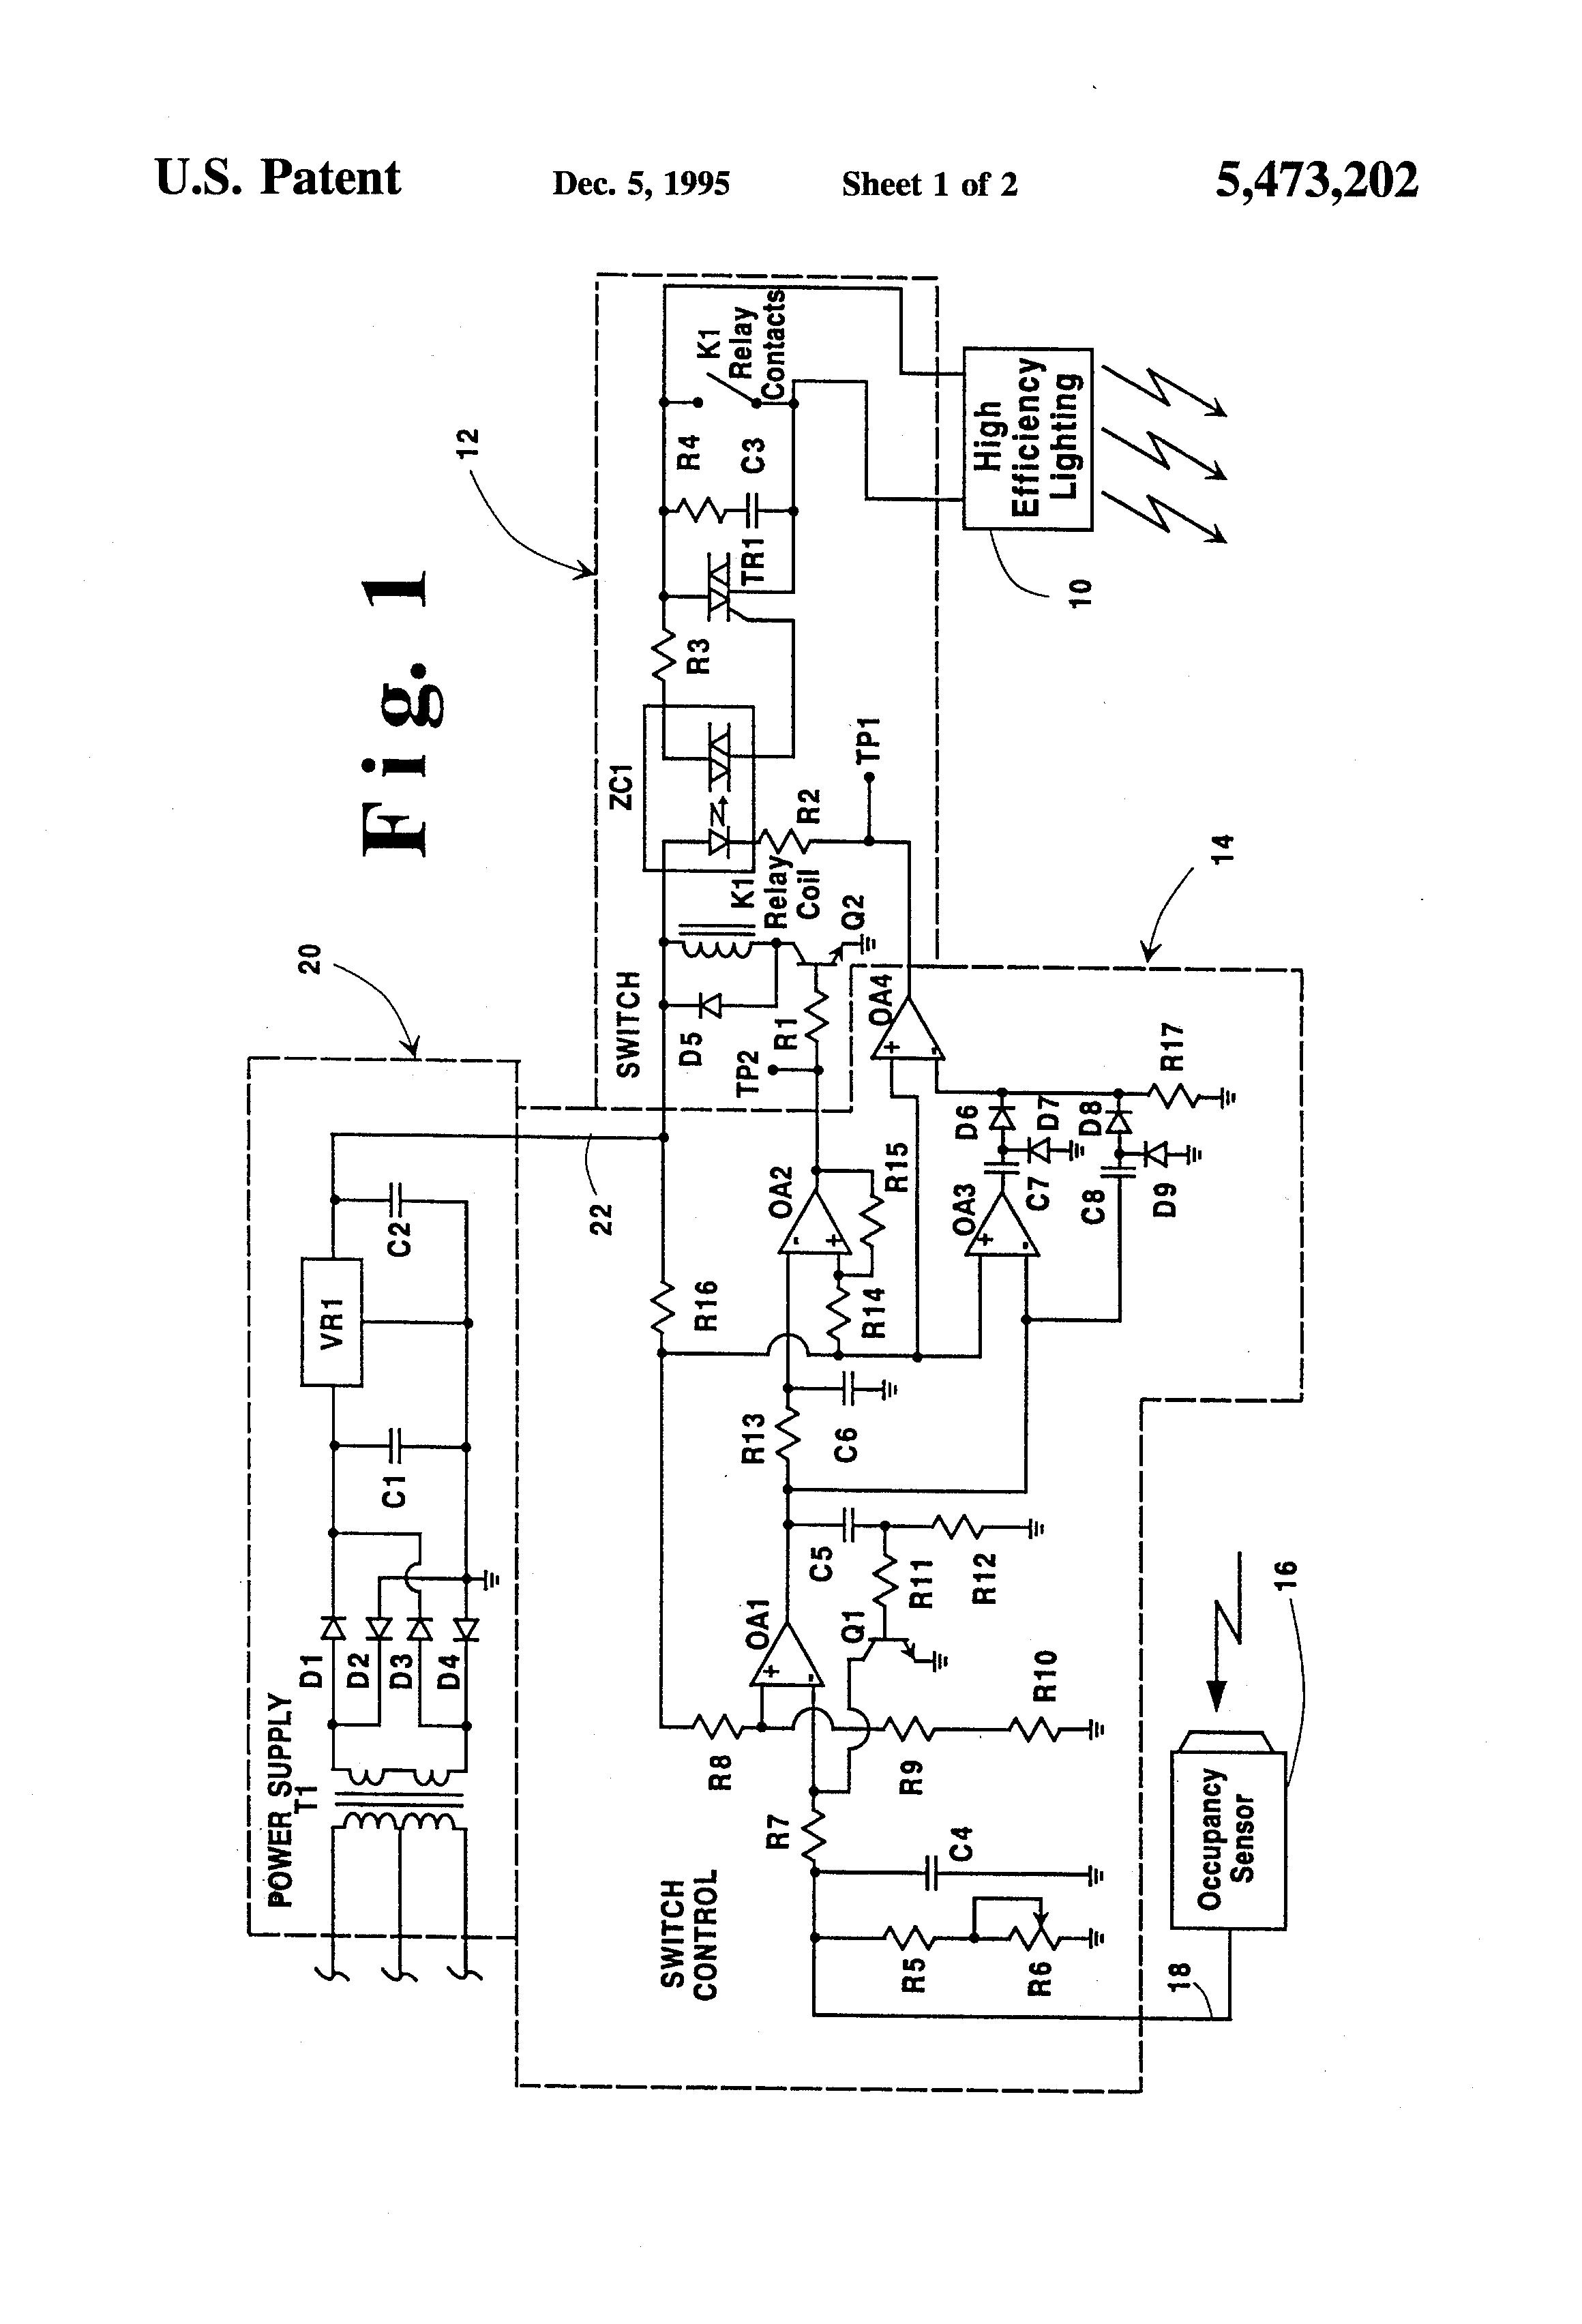 Occupancy Light Sensor Schaltplang Auto Electrical Wiring Diagram Hyundai Santro Fuse Box Patent Us5473202